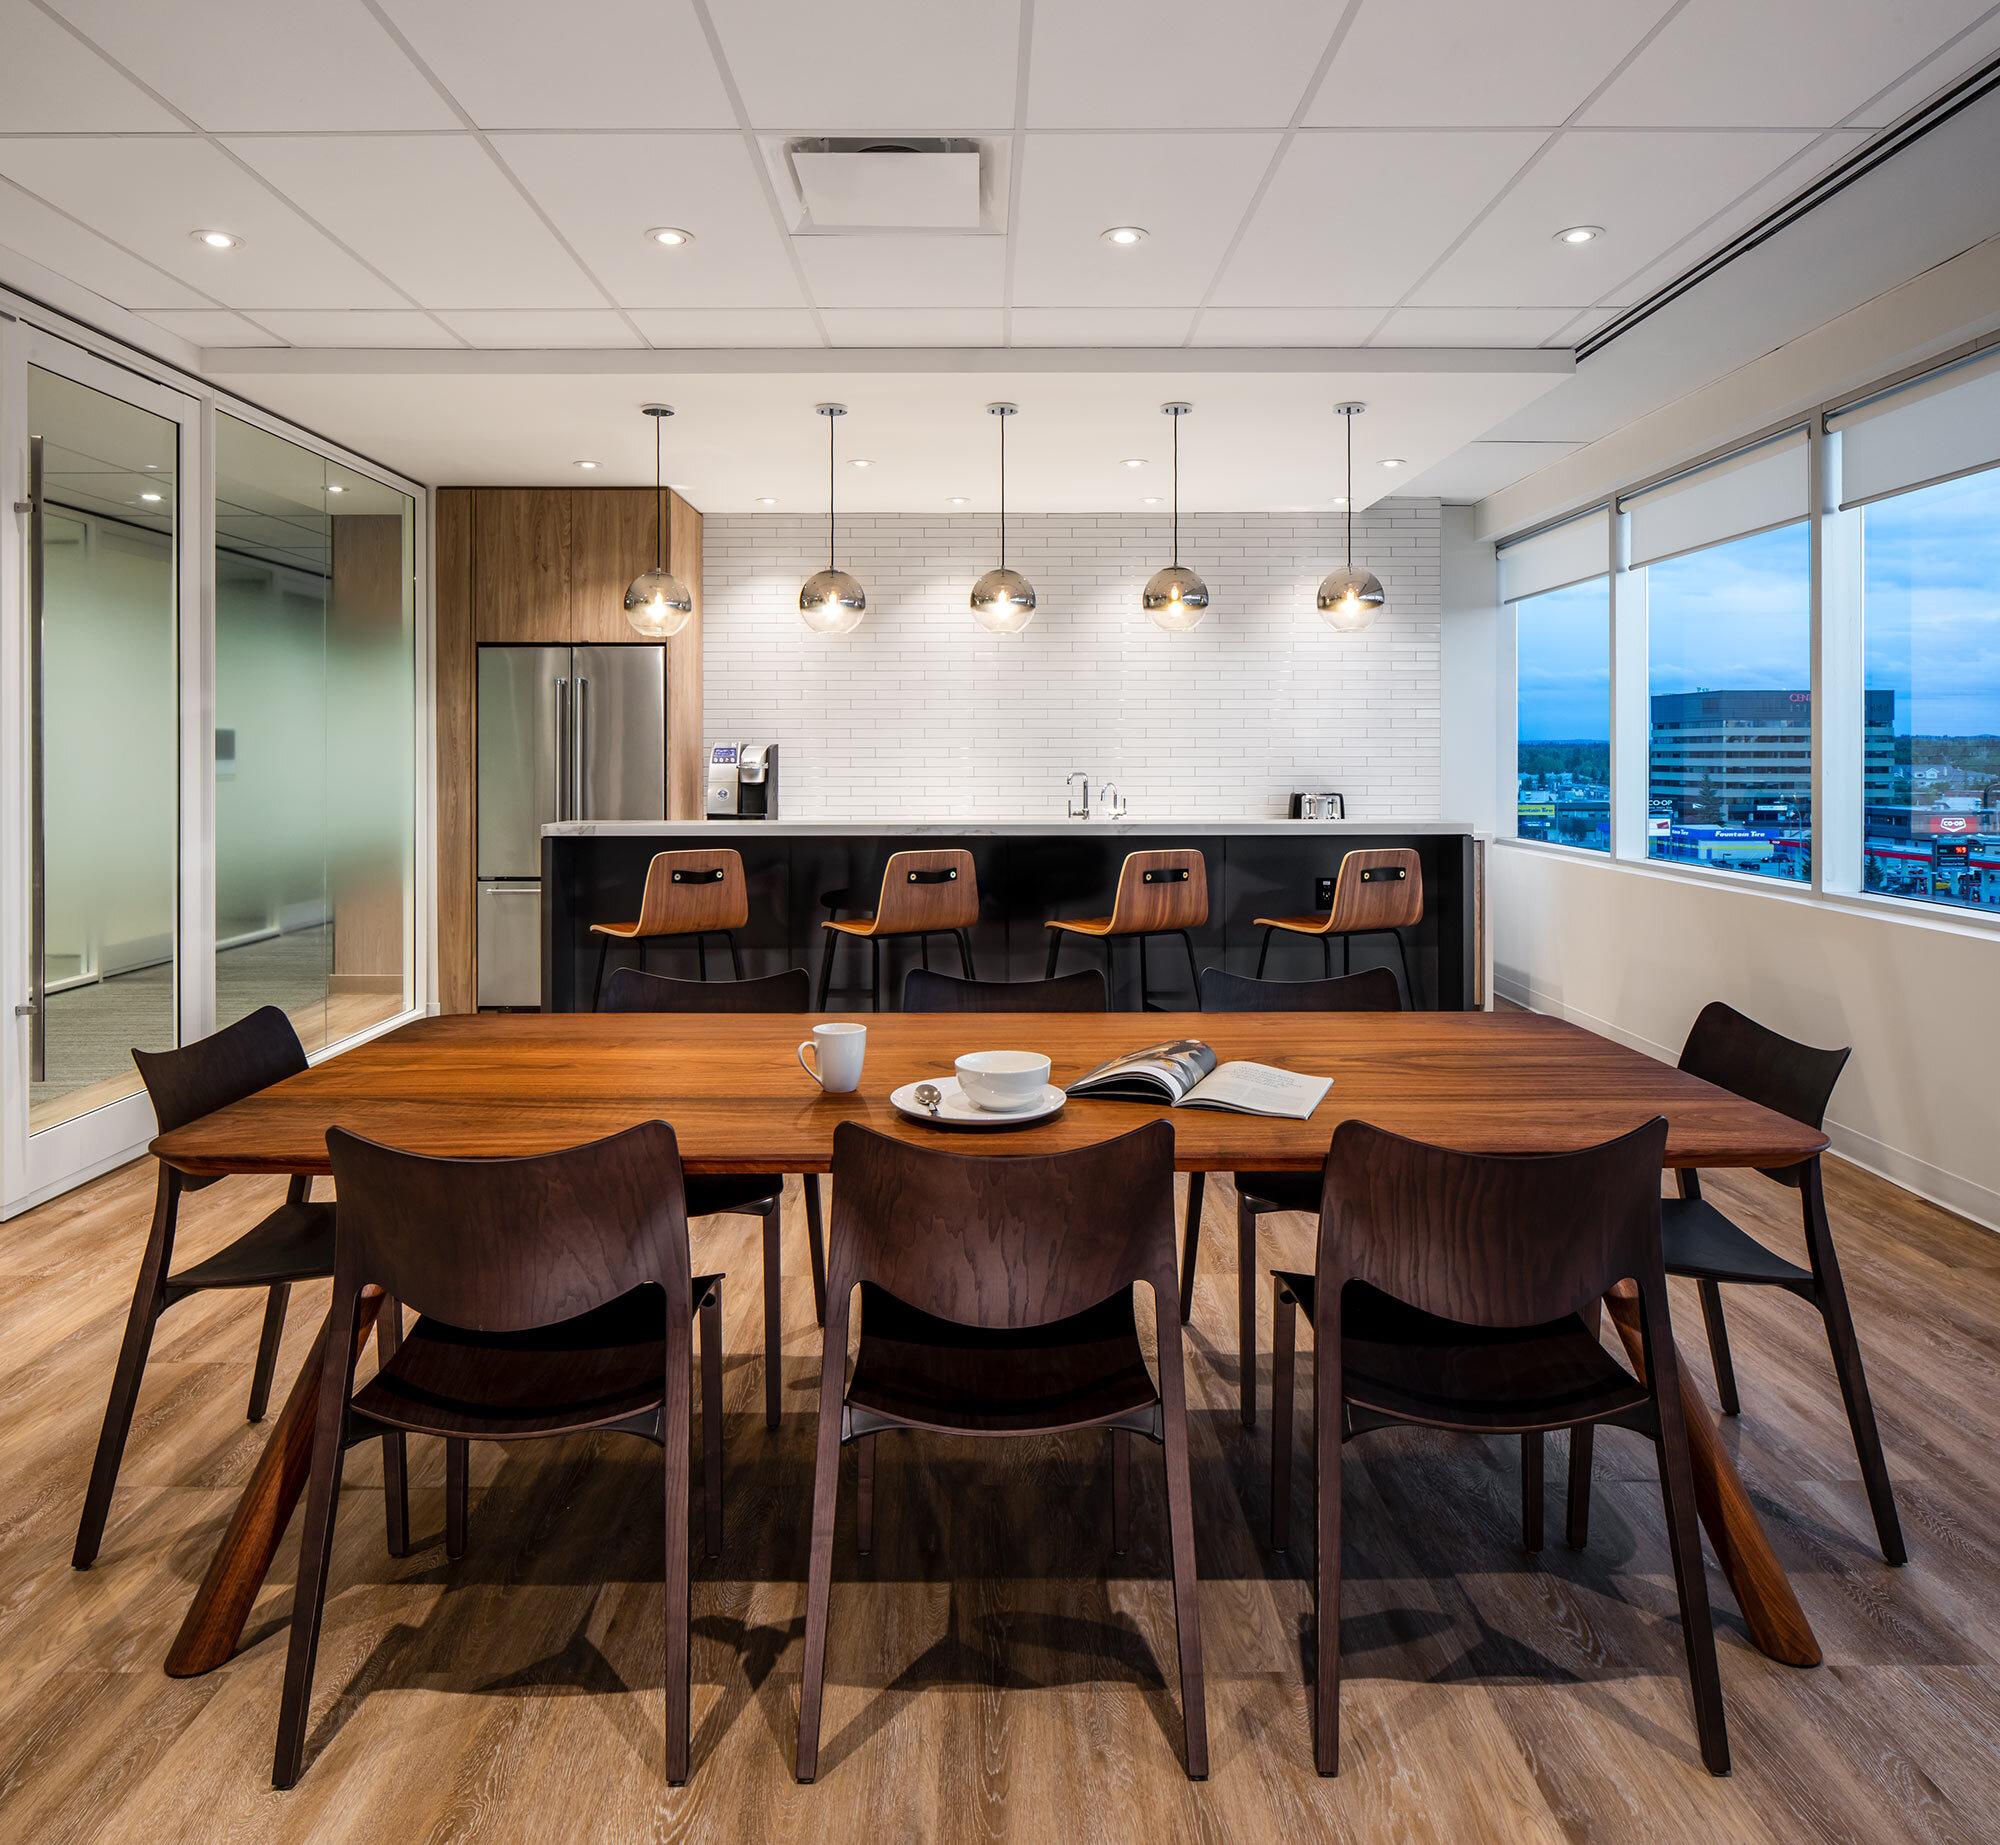 Insurance-services-interior-design-office-kitchen-table.jpg